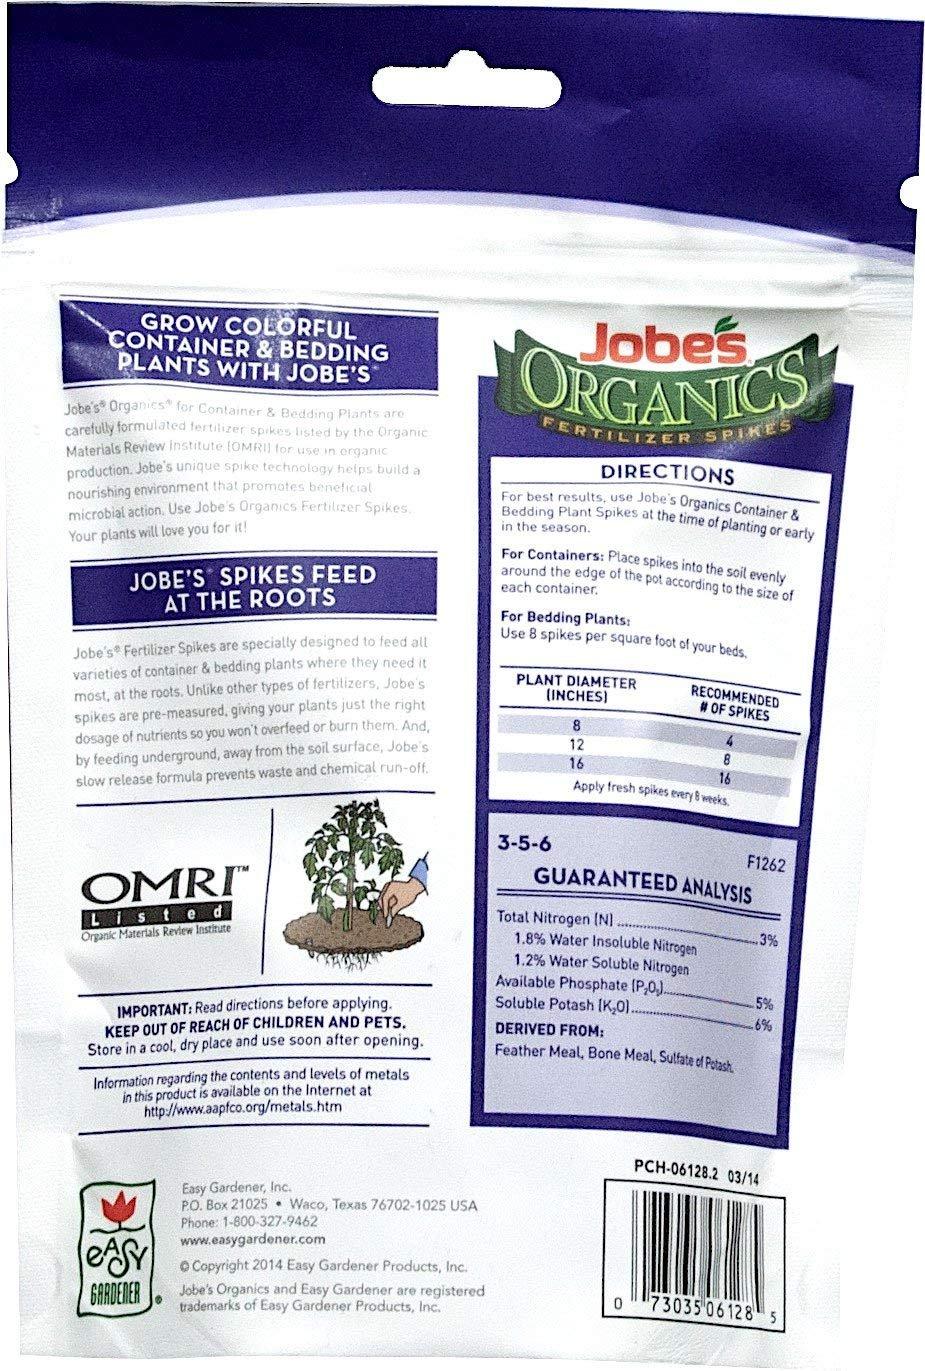 Ordinaire Amazon.com : Jobeu0027s Organic Container U0026 Bedding Fertilizer Spikes 3 5 7  (5 (Pack)) : Garden U0026 Outdoor